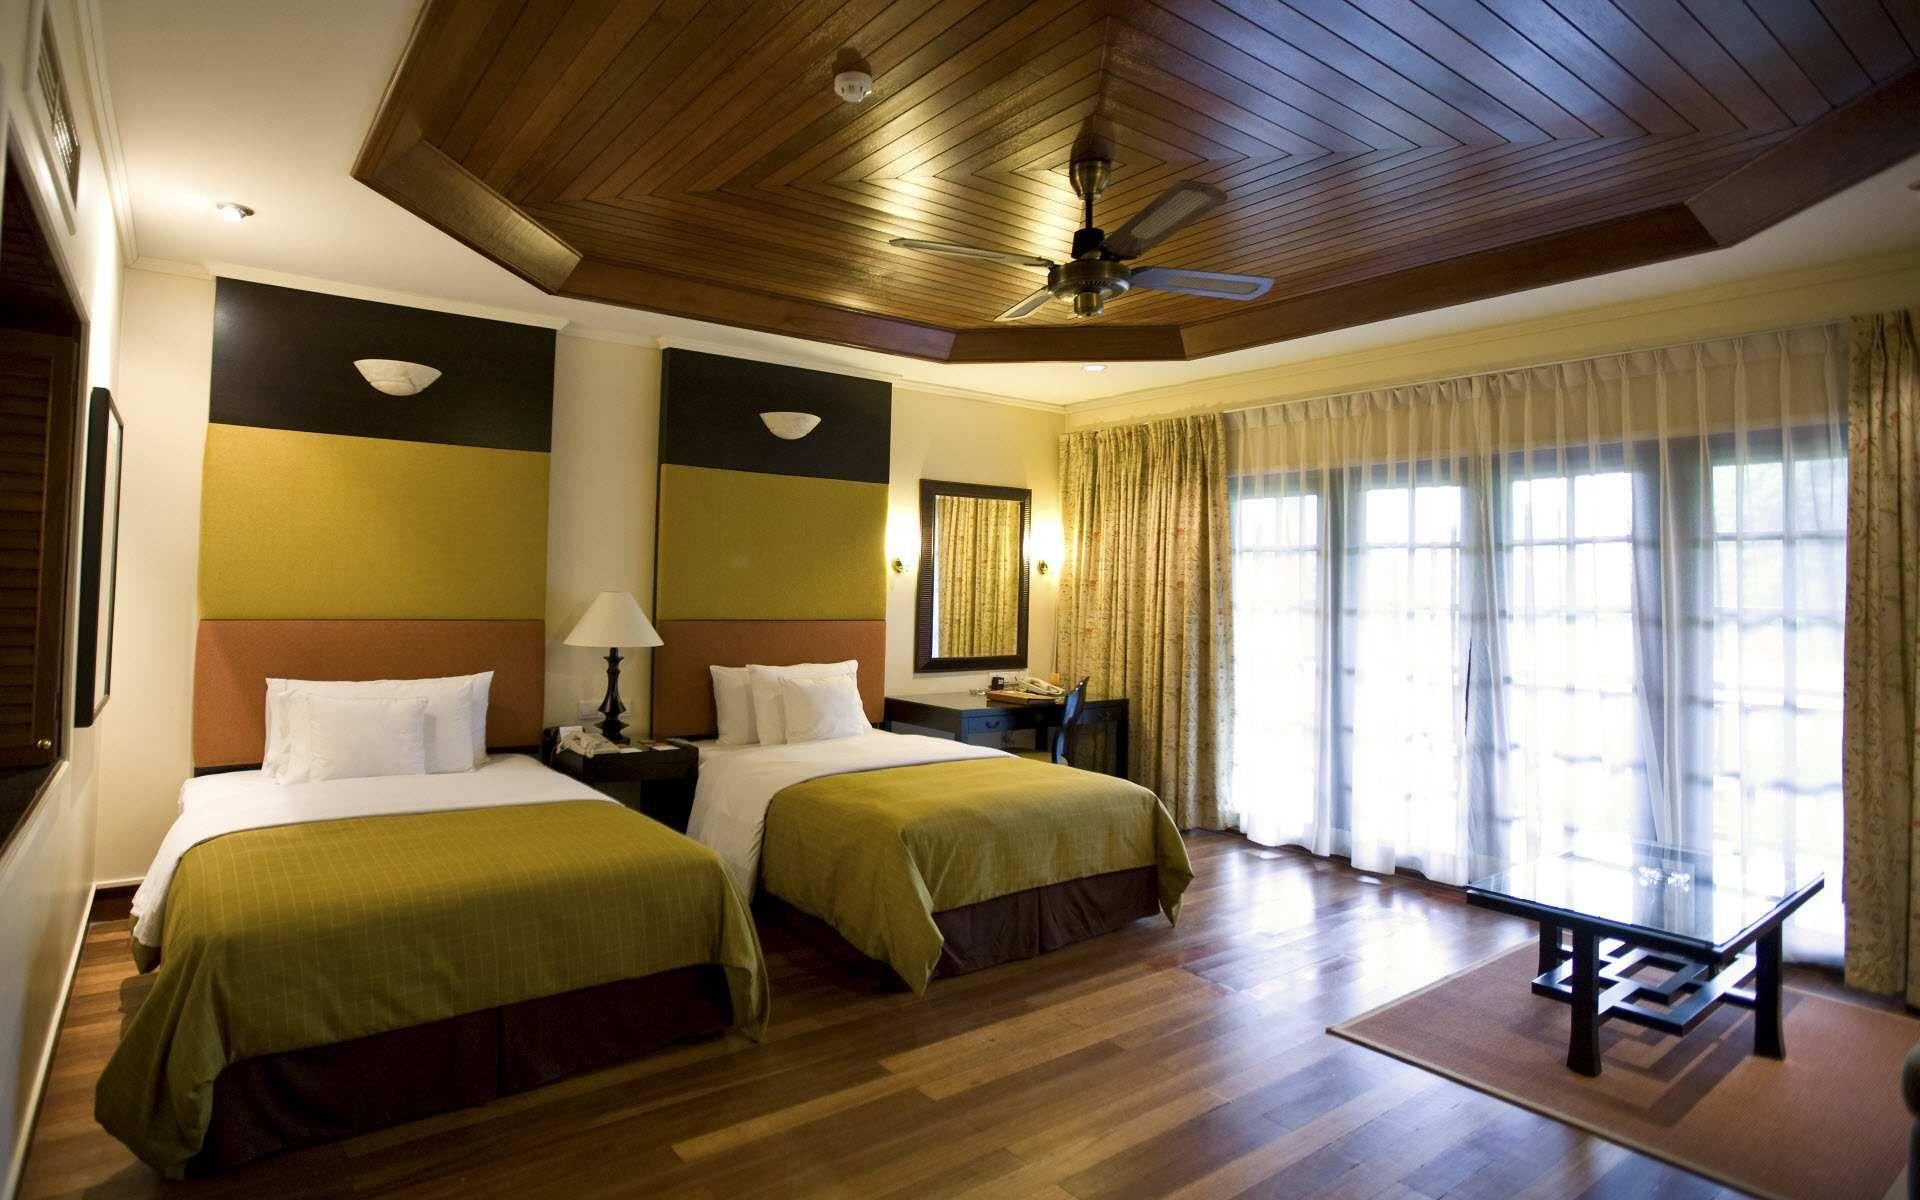 Bedroom Designers Overhead Plane  Articulation Corners & Surfaces  Pinterest